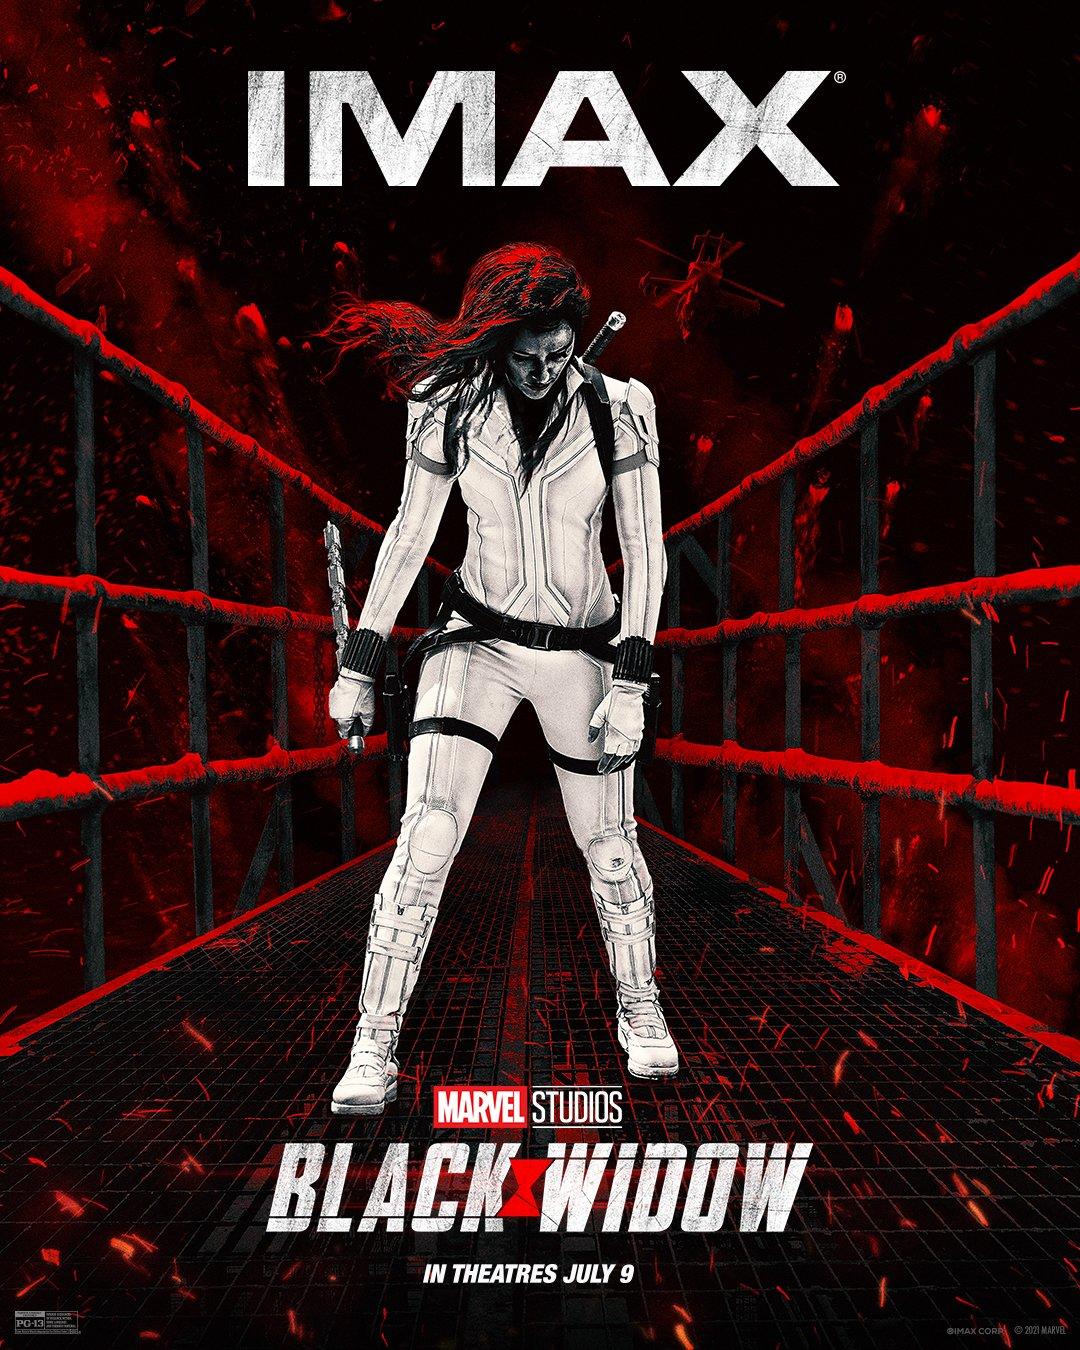 Póster IMAX de Black Widow (2021). Imagen: IMAX Twitter (@IMAX).